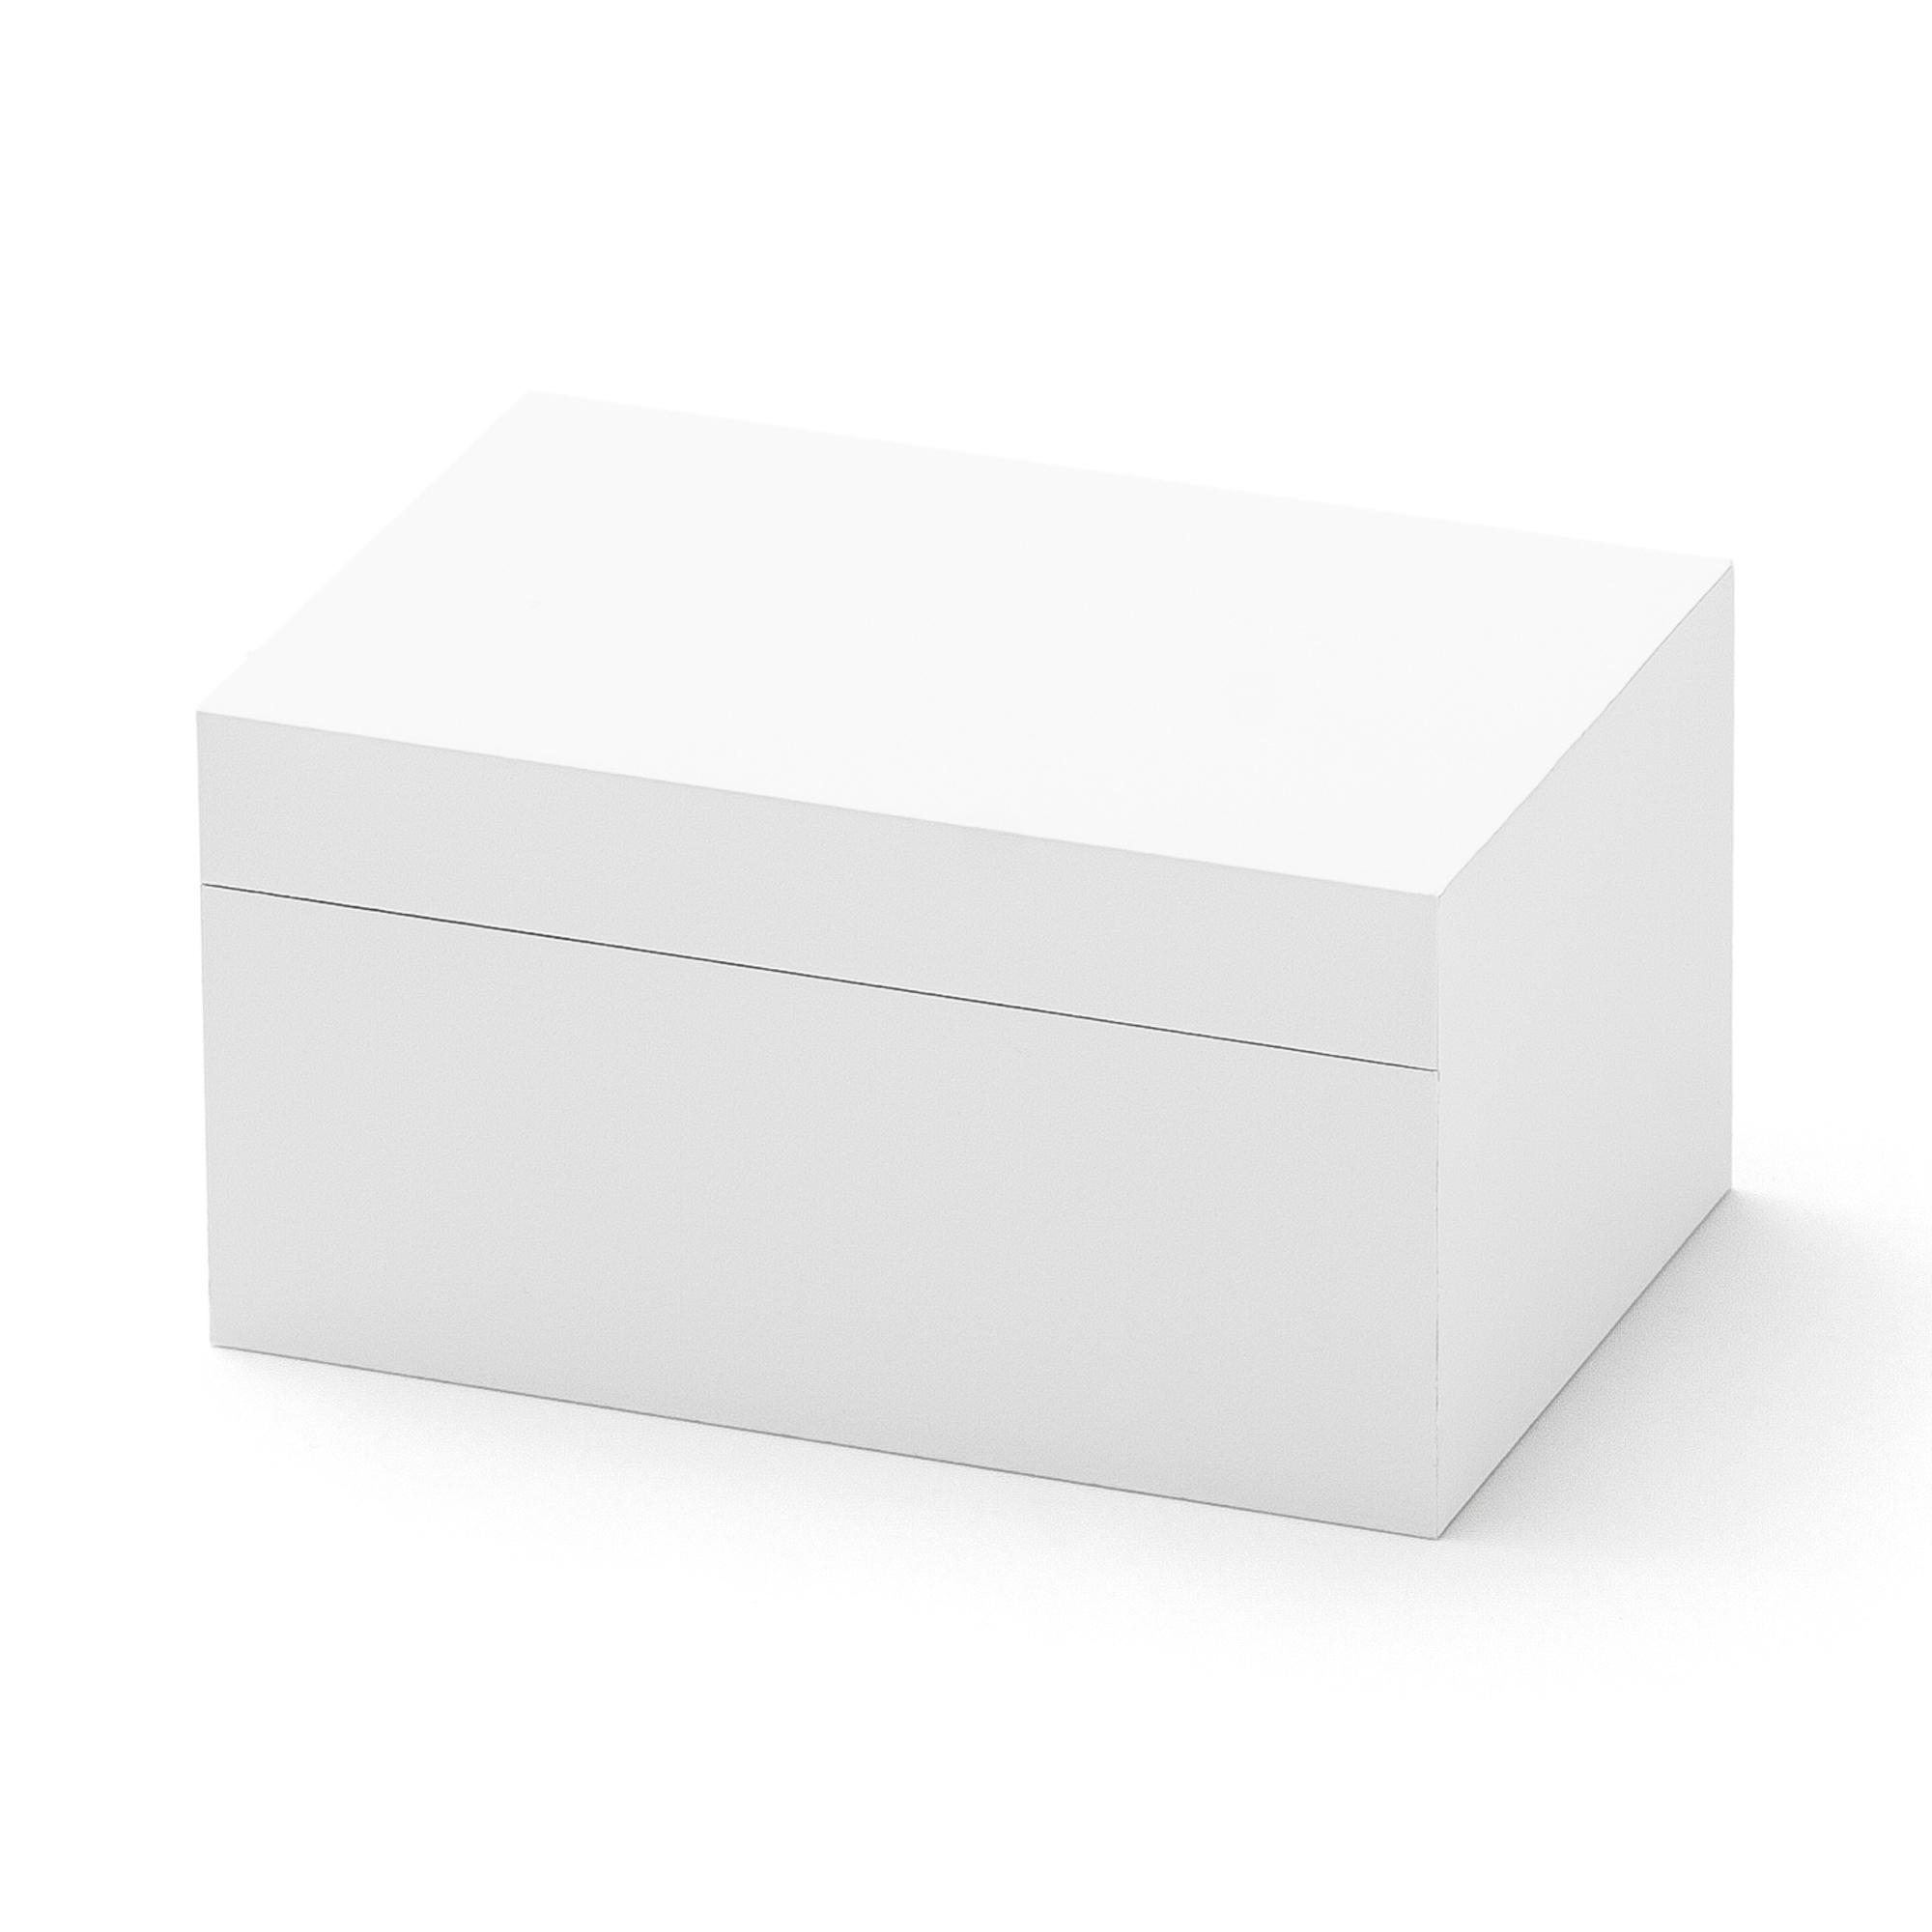 WHITEBOX Trauring